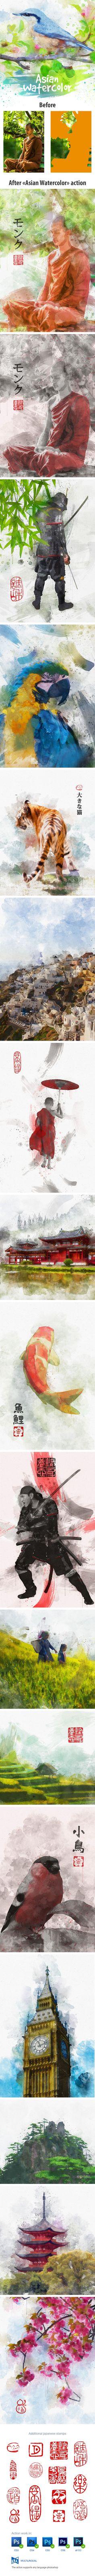 Ознакомьтесь с моим проектом @Behance: «Asian Watercolor Photoshop Action» https://www.behance.net/gallery/53784225/Asian-Watercolor-Photoshop-Action